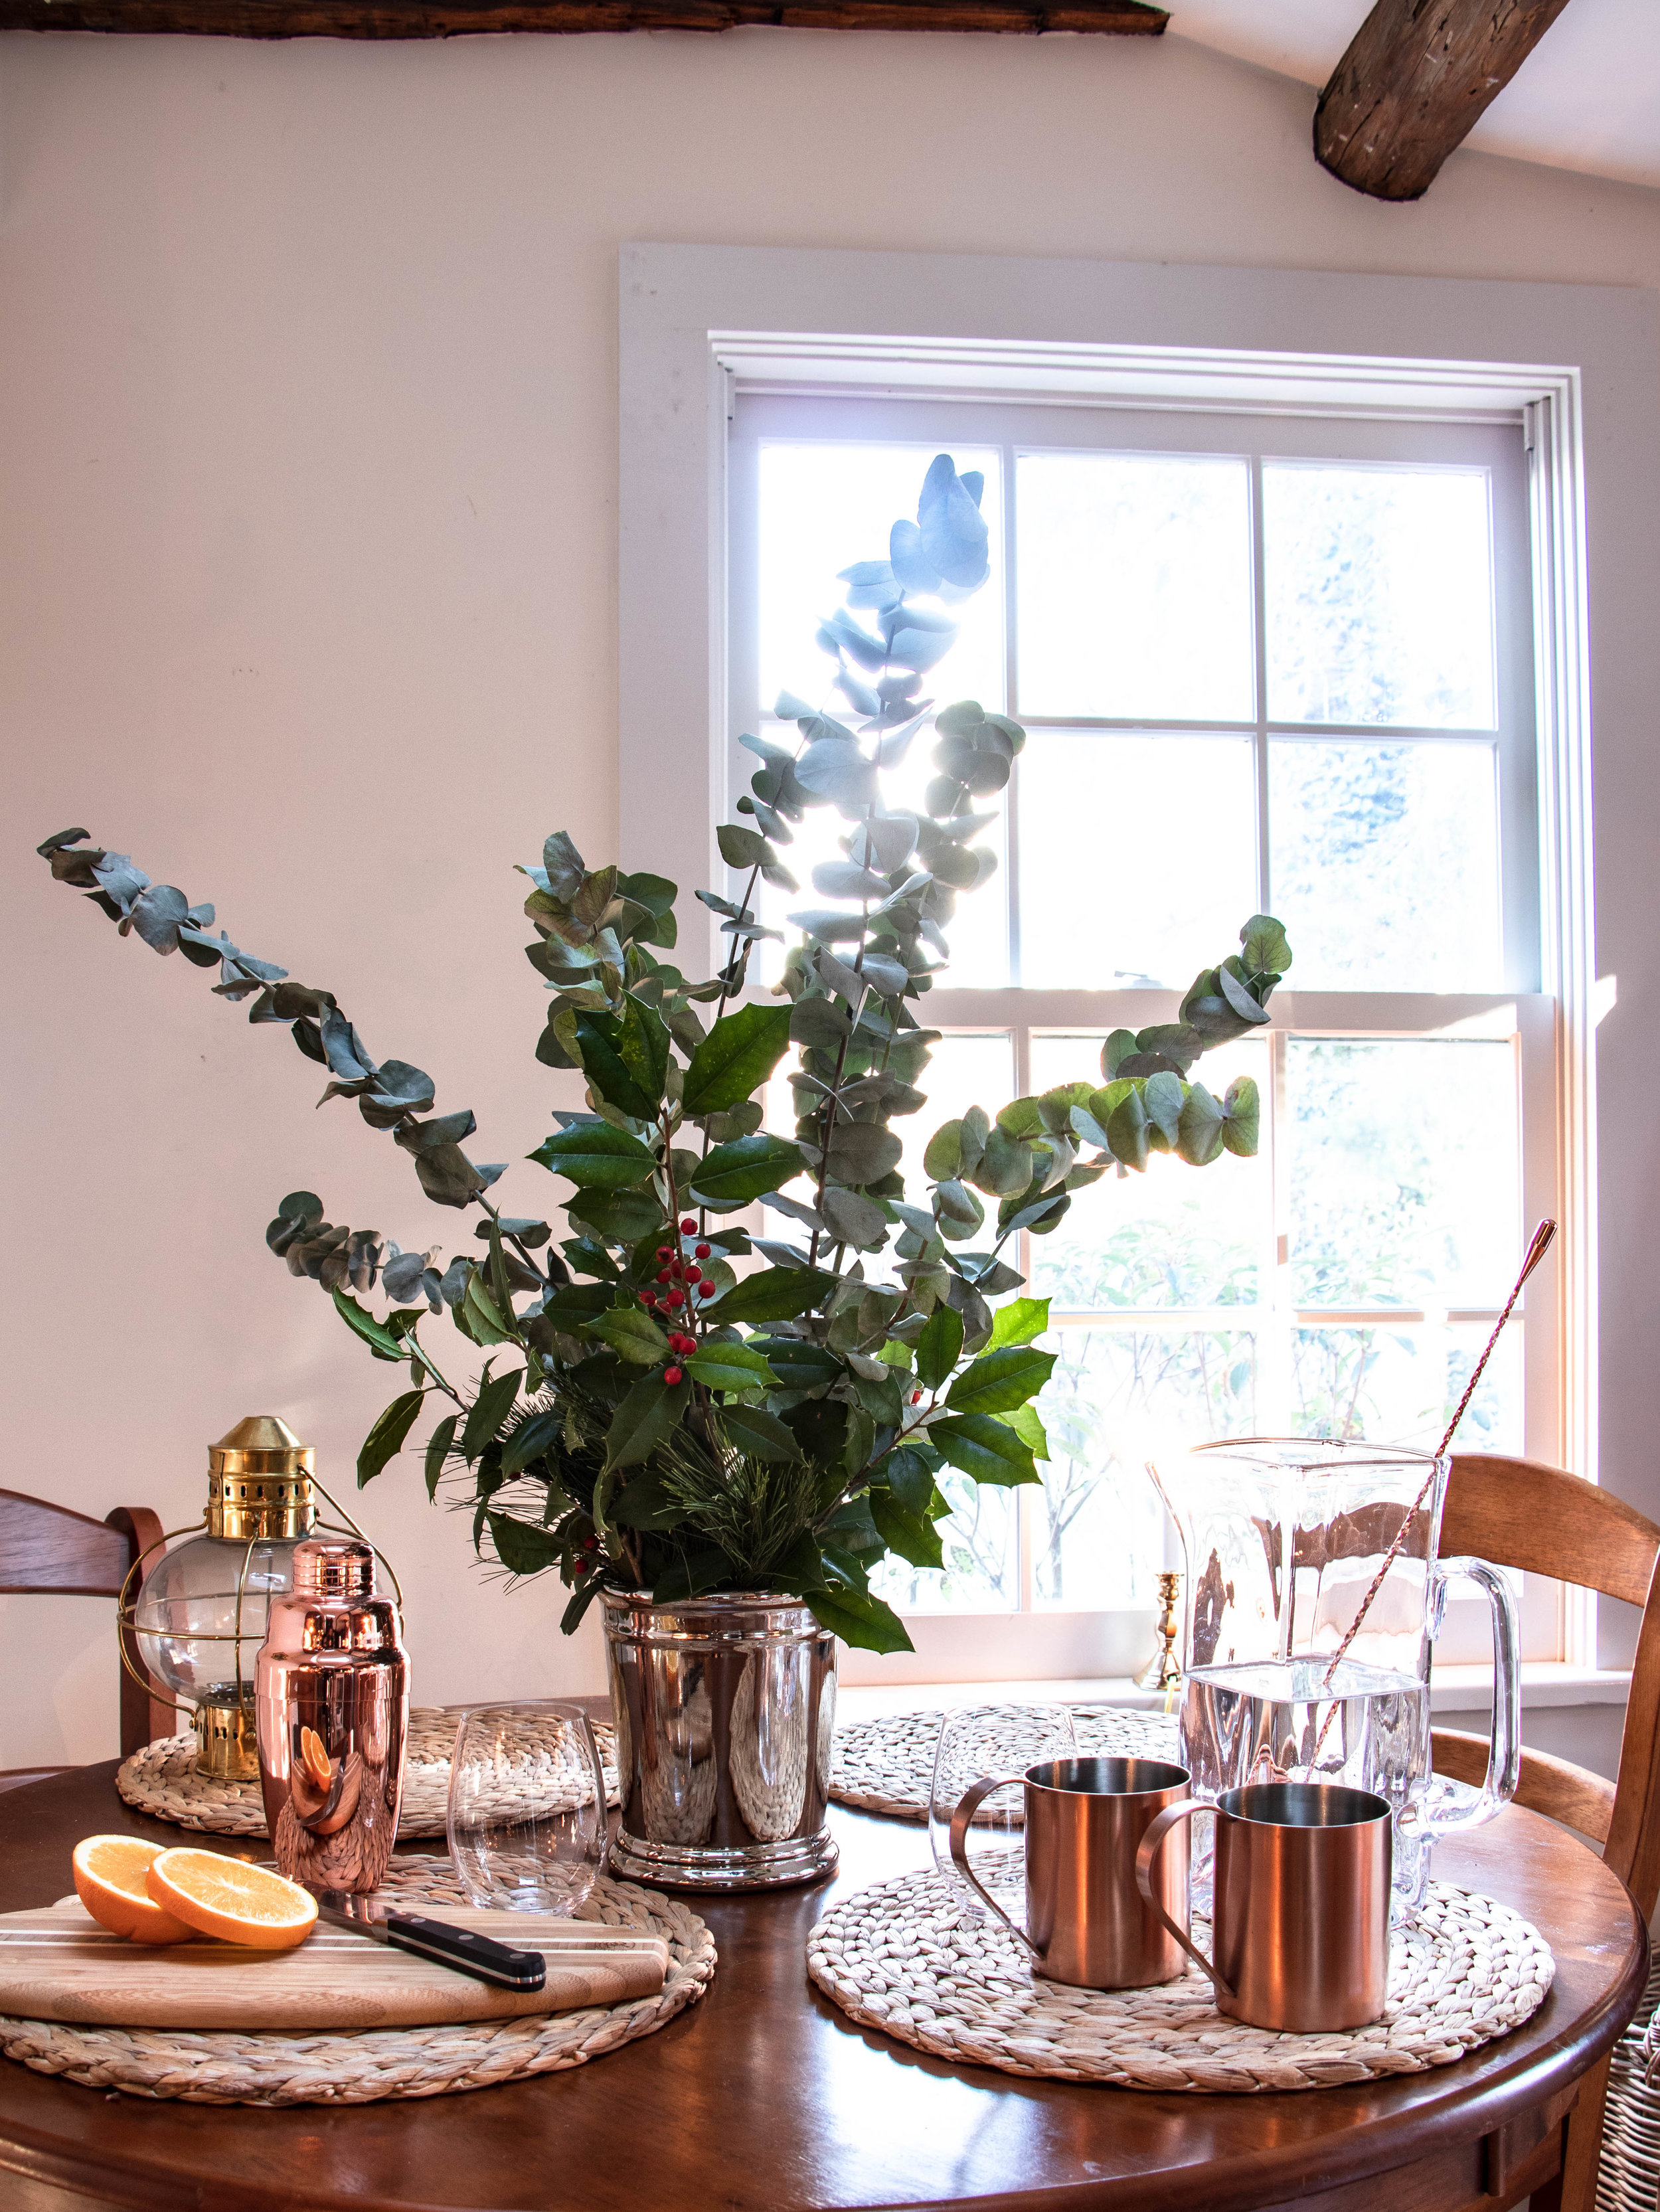 Eucalyptus-Pine-Holly Christmas-Holiday Centerpiece-Arrangement